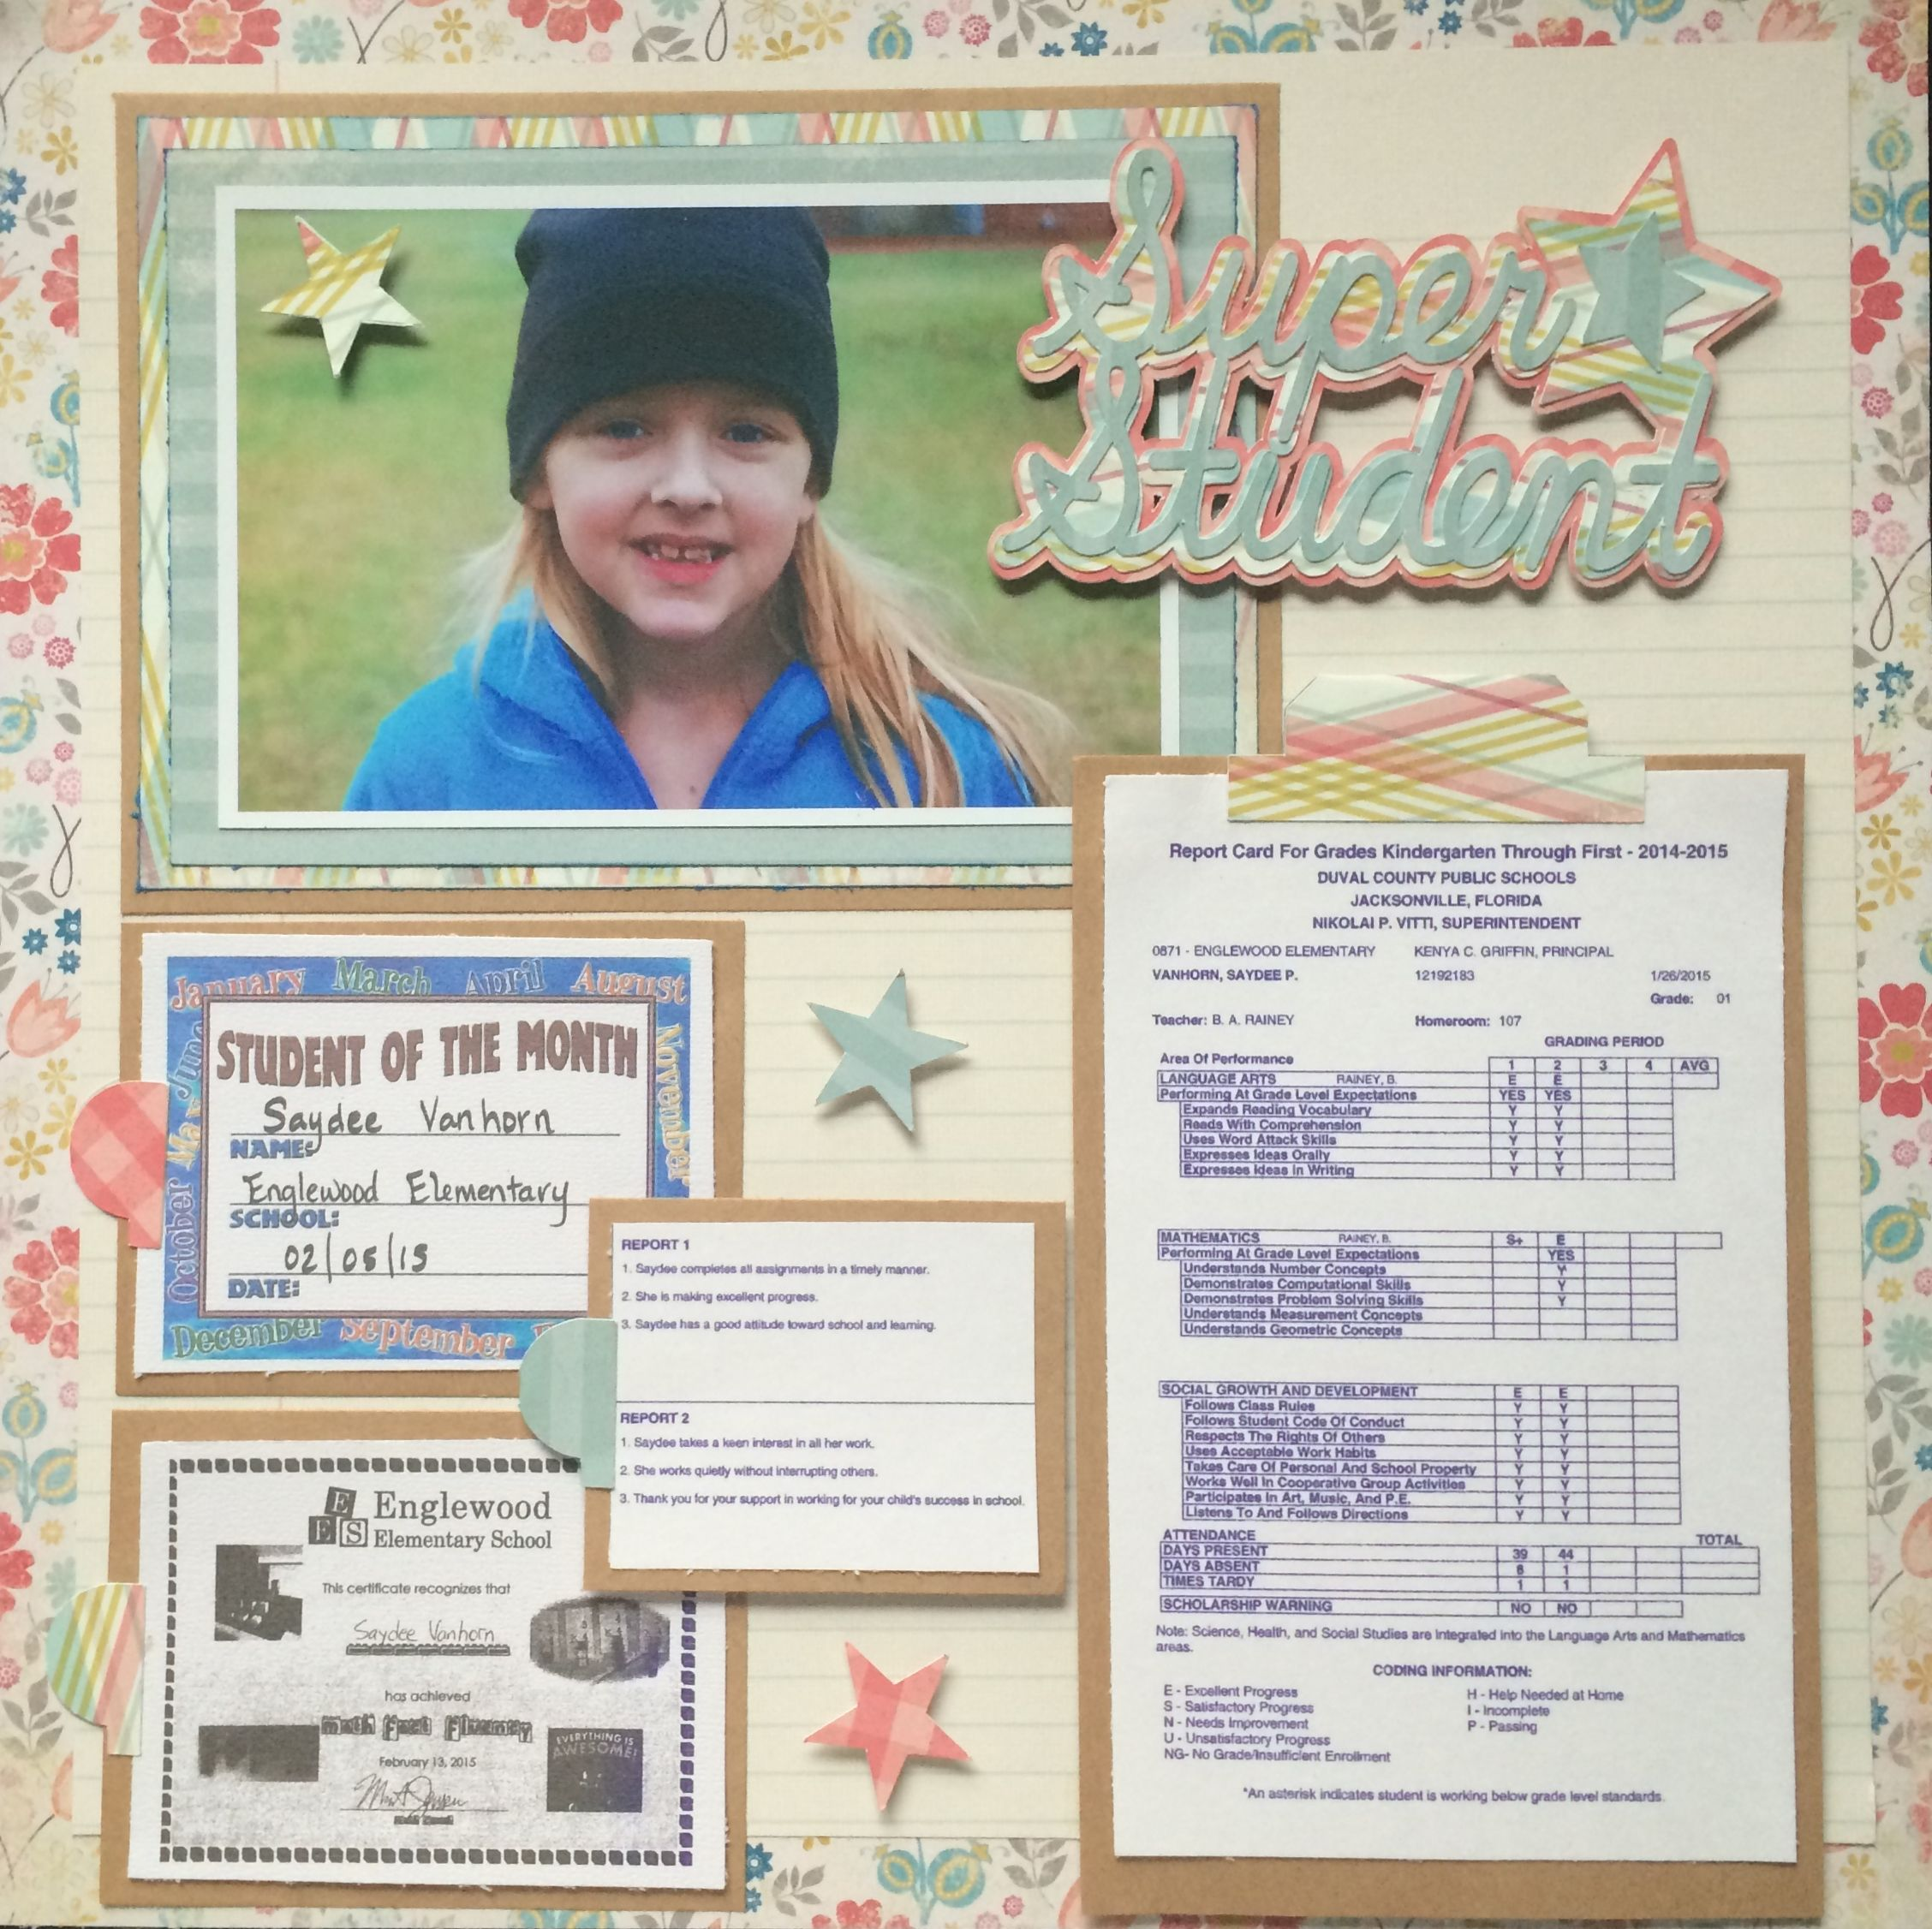 Elementary school scrapbook ideas - Star Student Scrapbook Page Cricut Explore